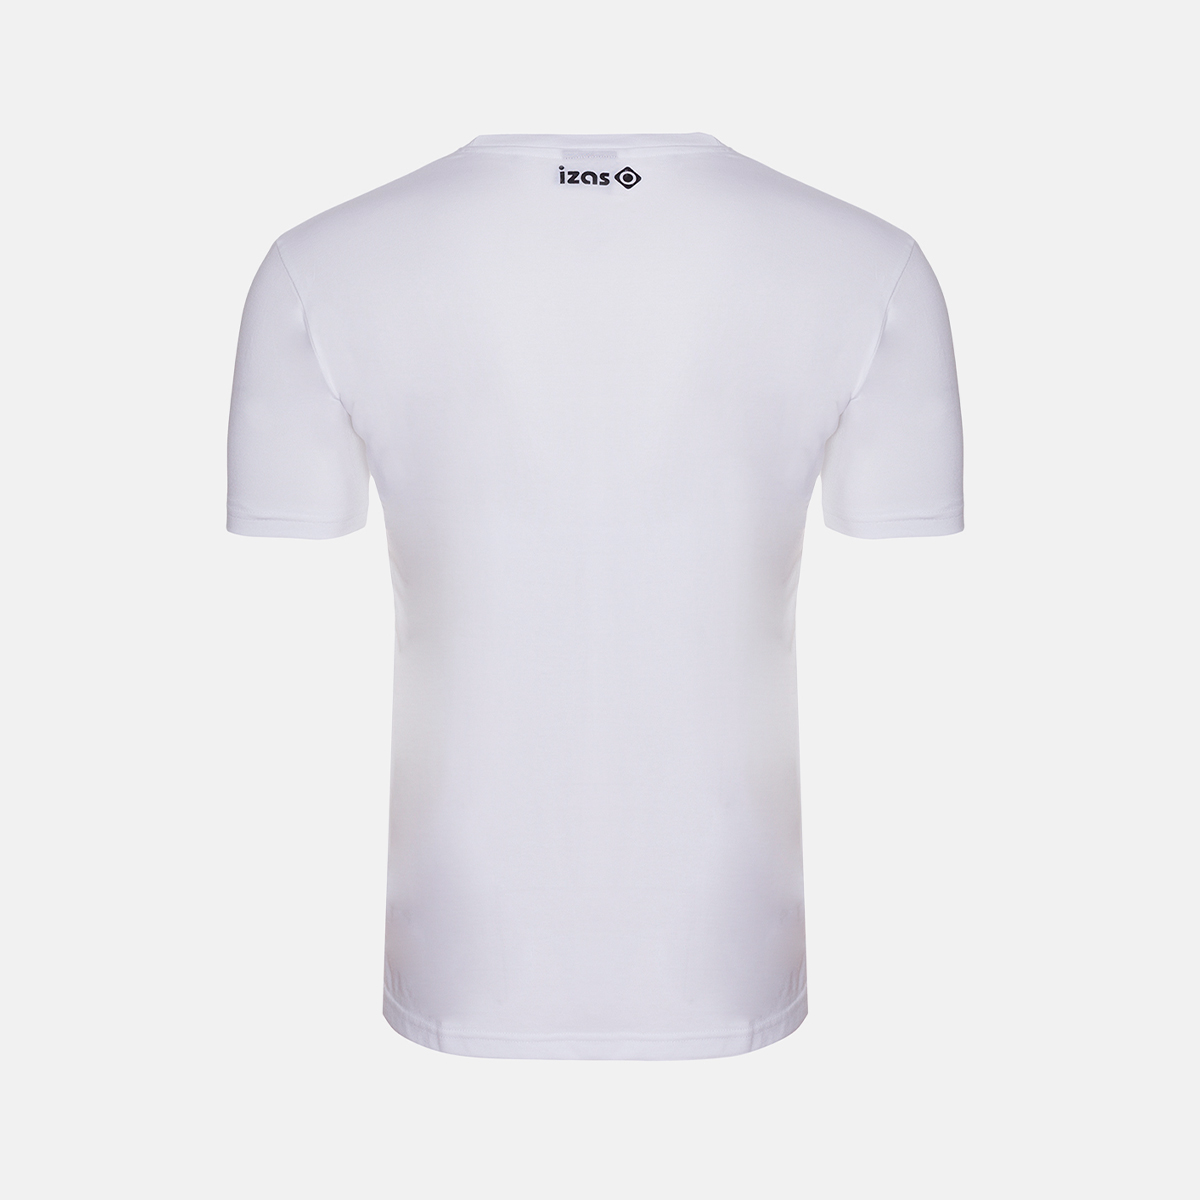 MAN'S ALBANY SHORT SLEEVE T-SHIRT WHITE